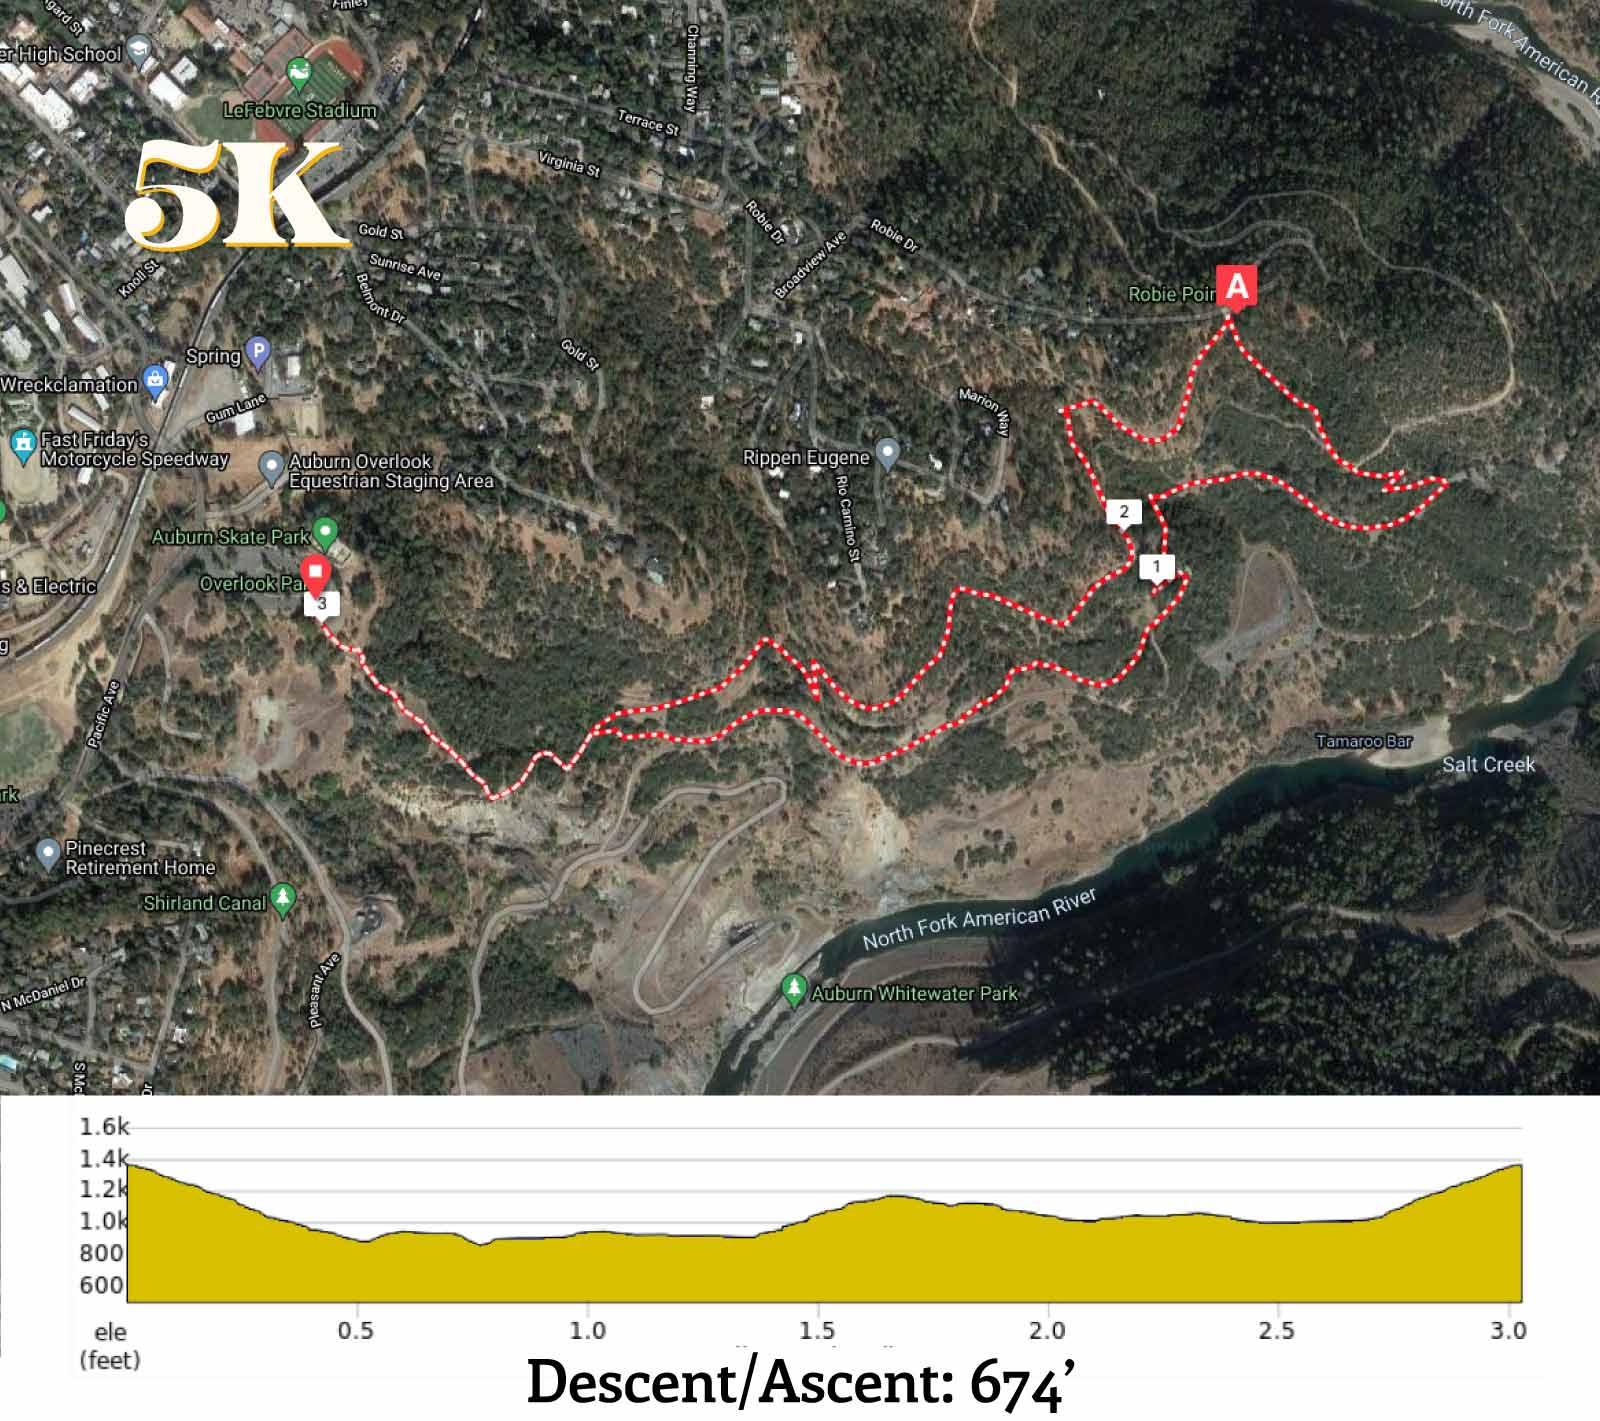 Auburn-5K-map-and-elevation